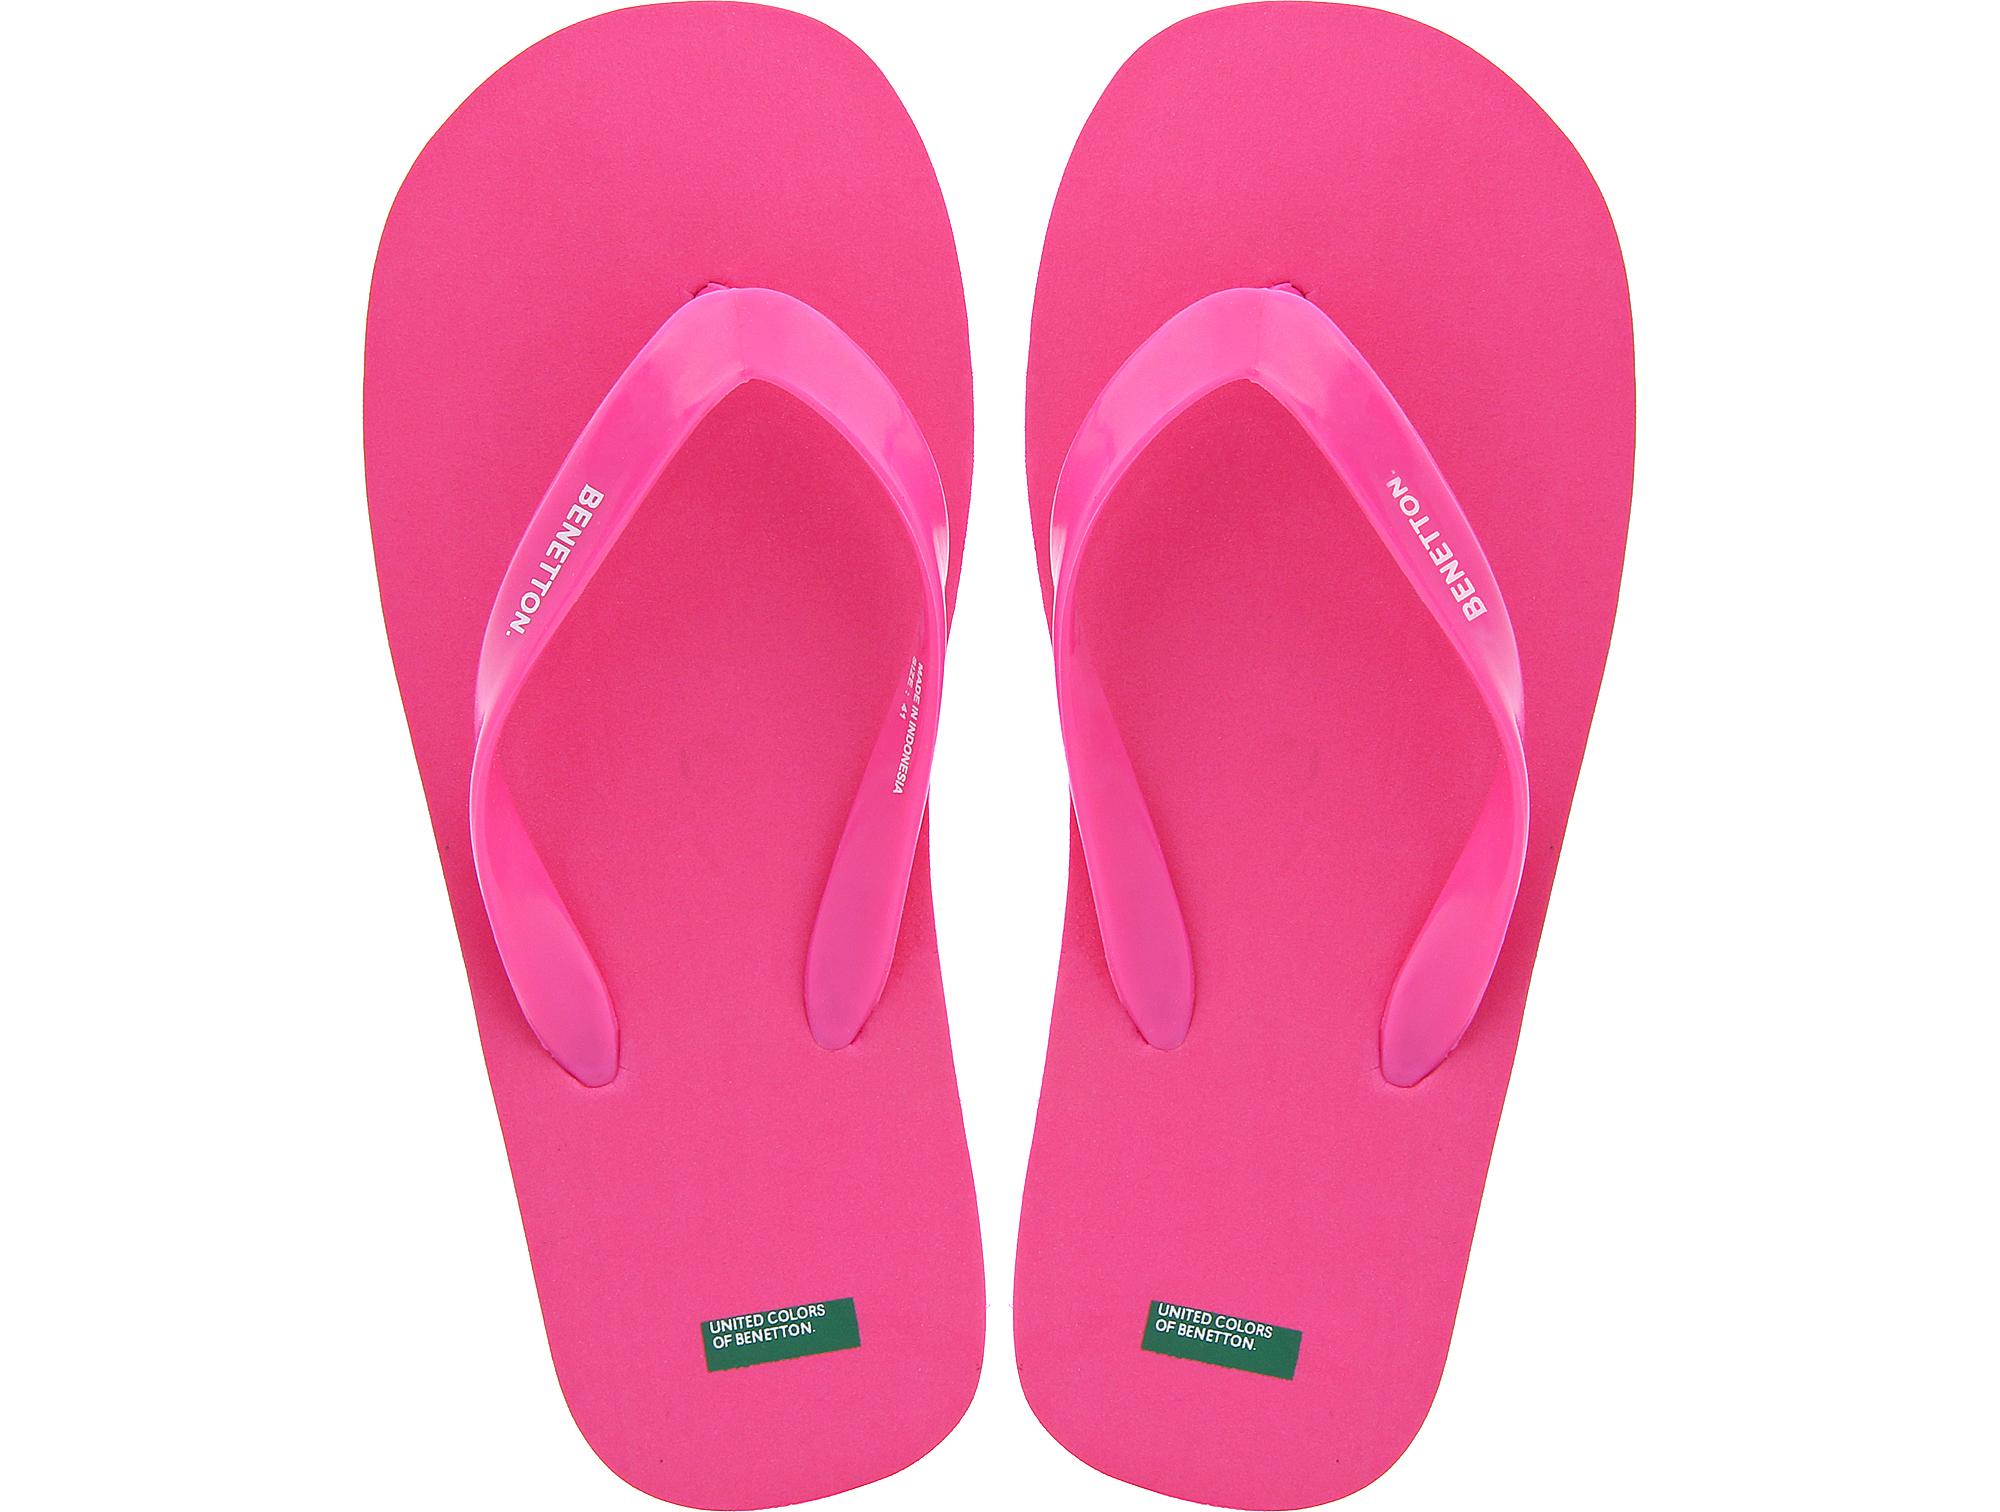 Фото #1: Пляжная обувь United Colours of Benetton 603 розовый